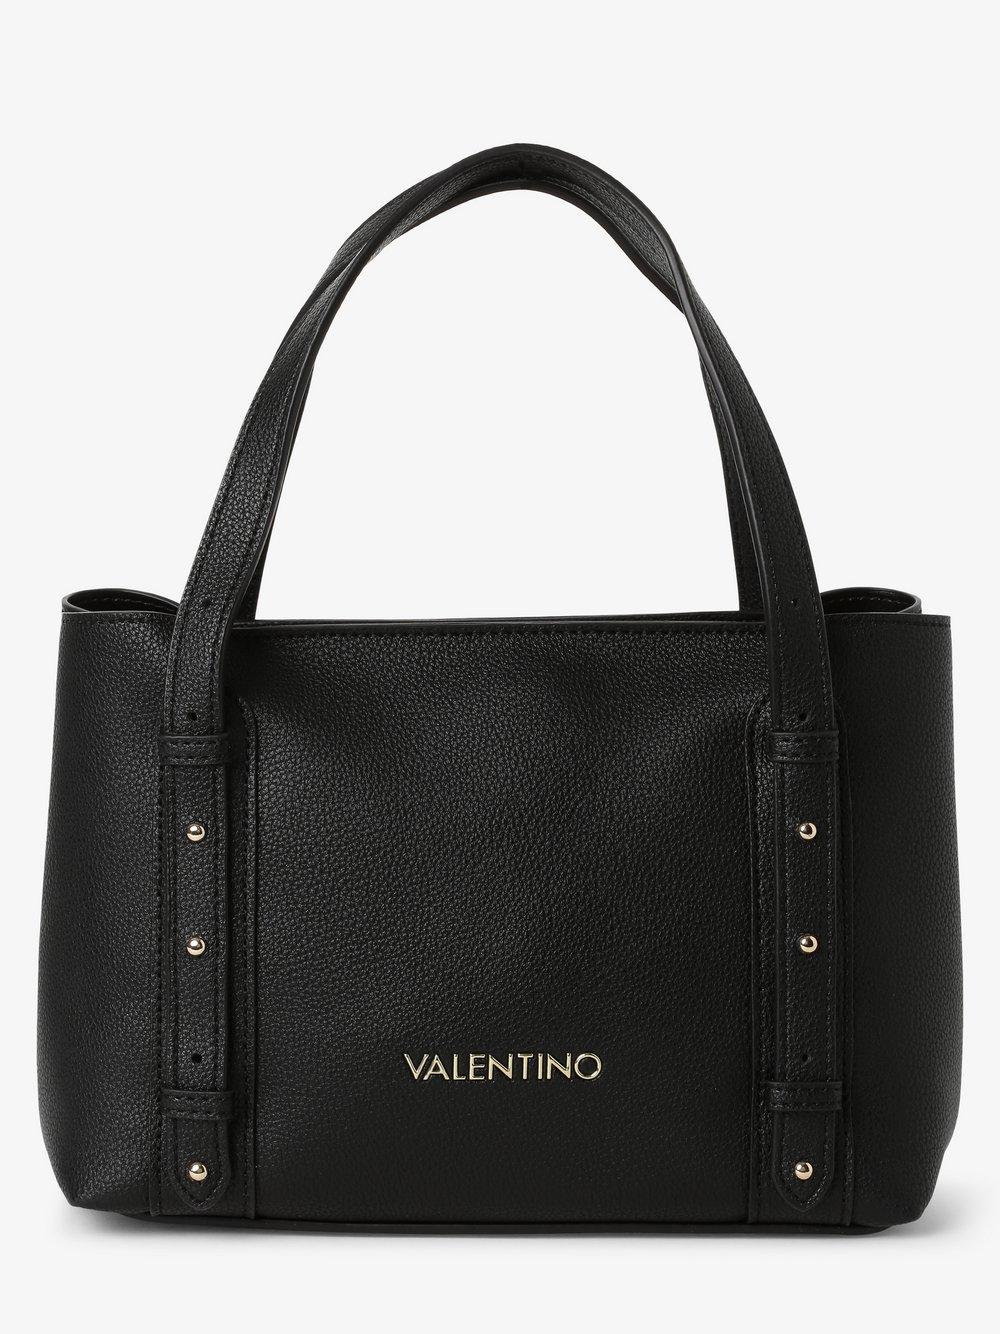 VALENTINO HANDBAGS – Torebka damska z torebką wewnętrzną – Alma, szary Van Graaf 465312-0001